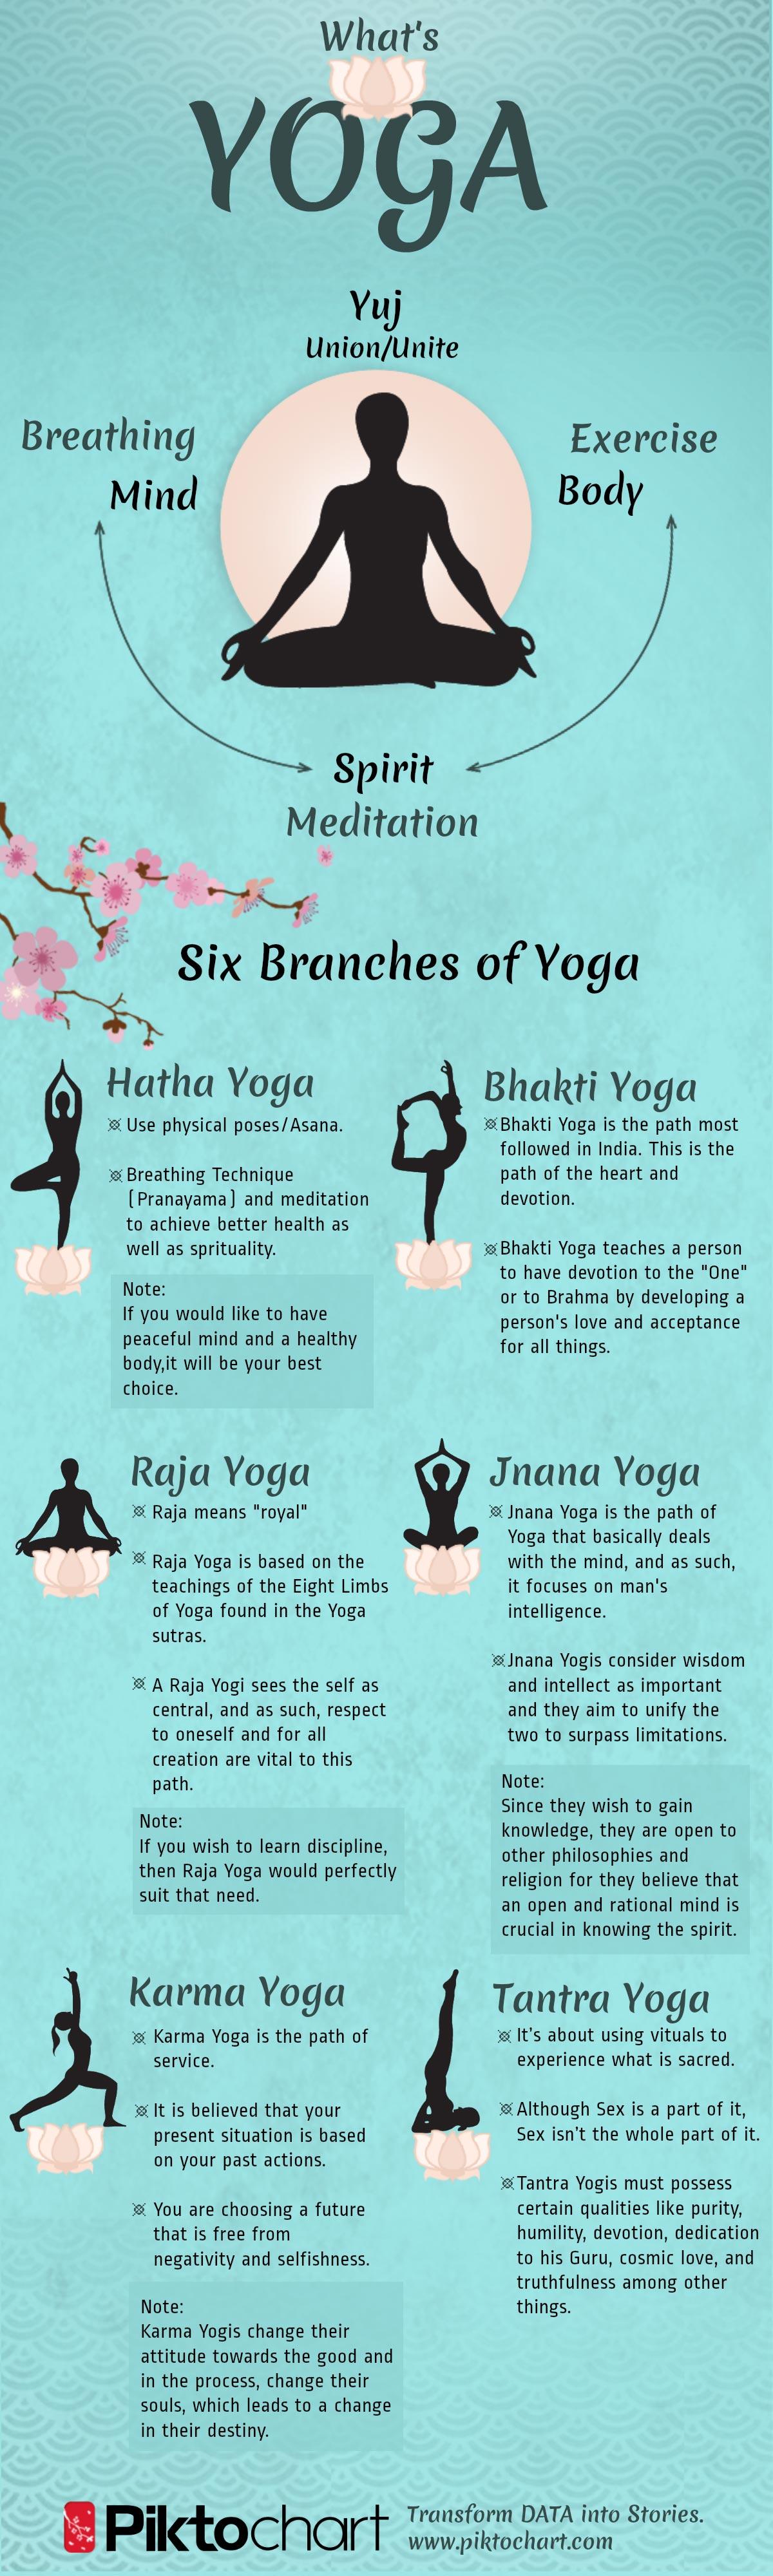 Raja Yoga The Twisted Monkey